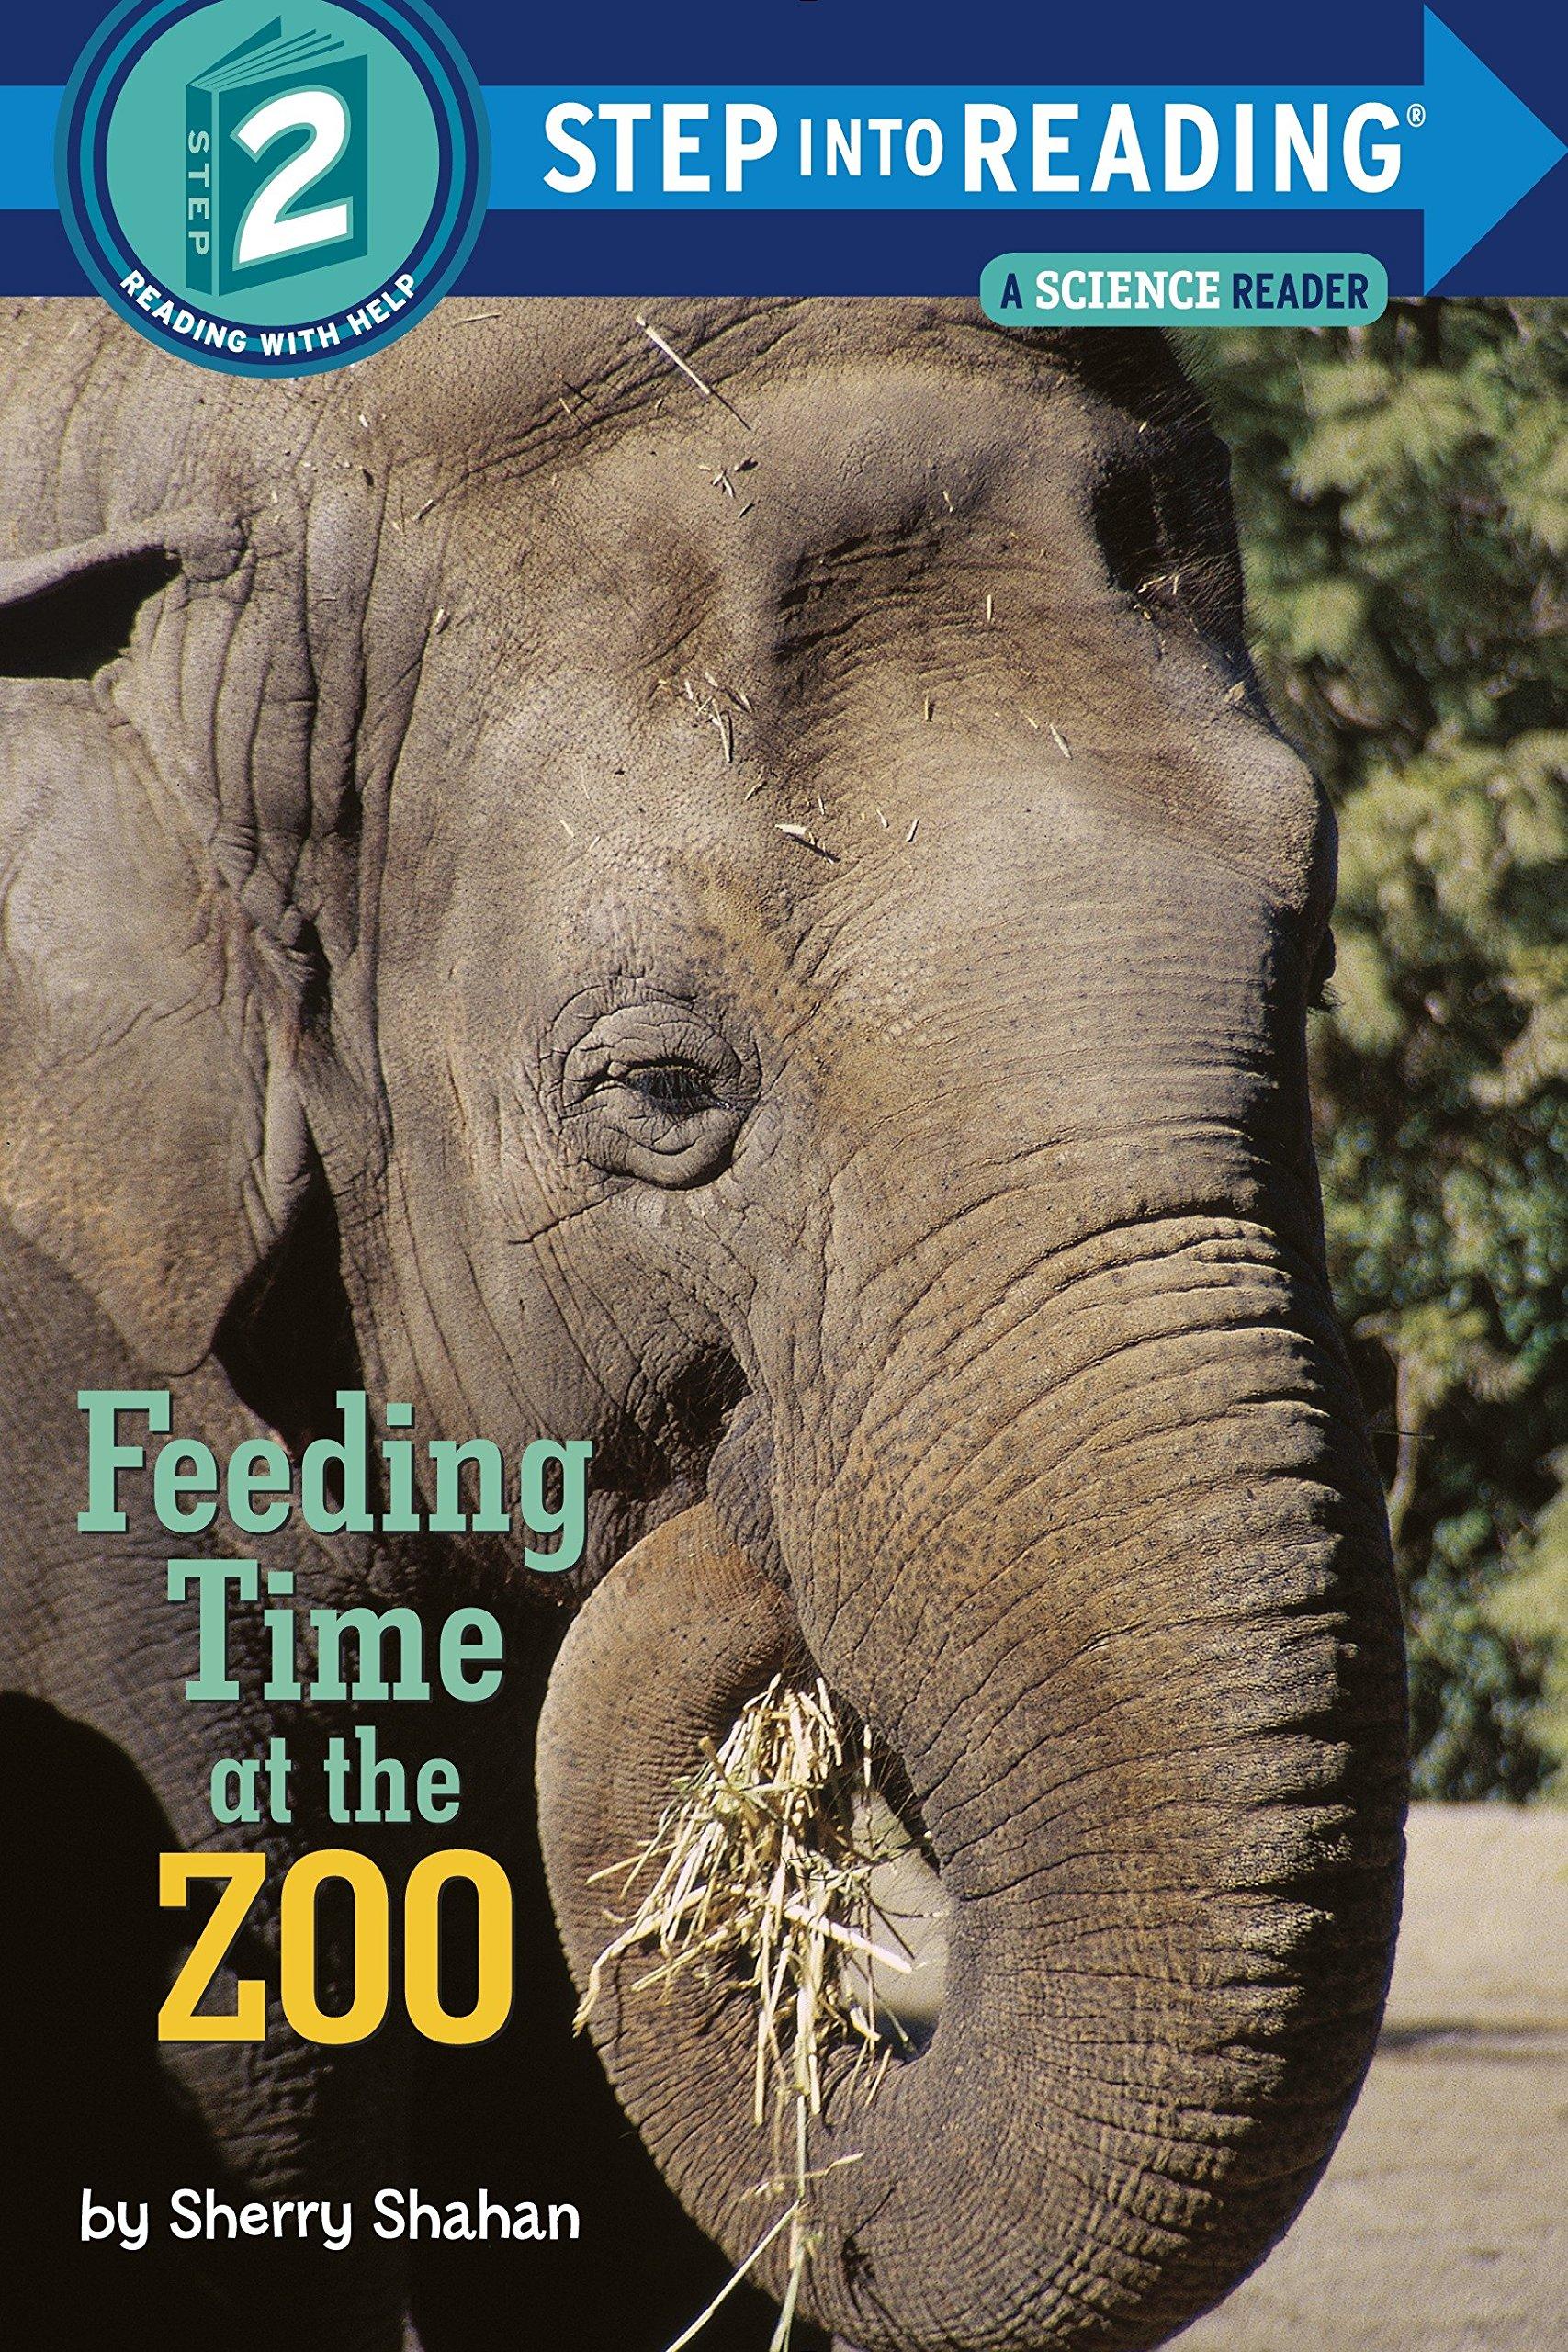 Amazon.com: Feeding Time at the Zoo (Step into Reading) (9780385371902):  Sherry Shahan: Books